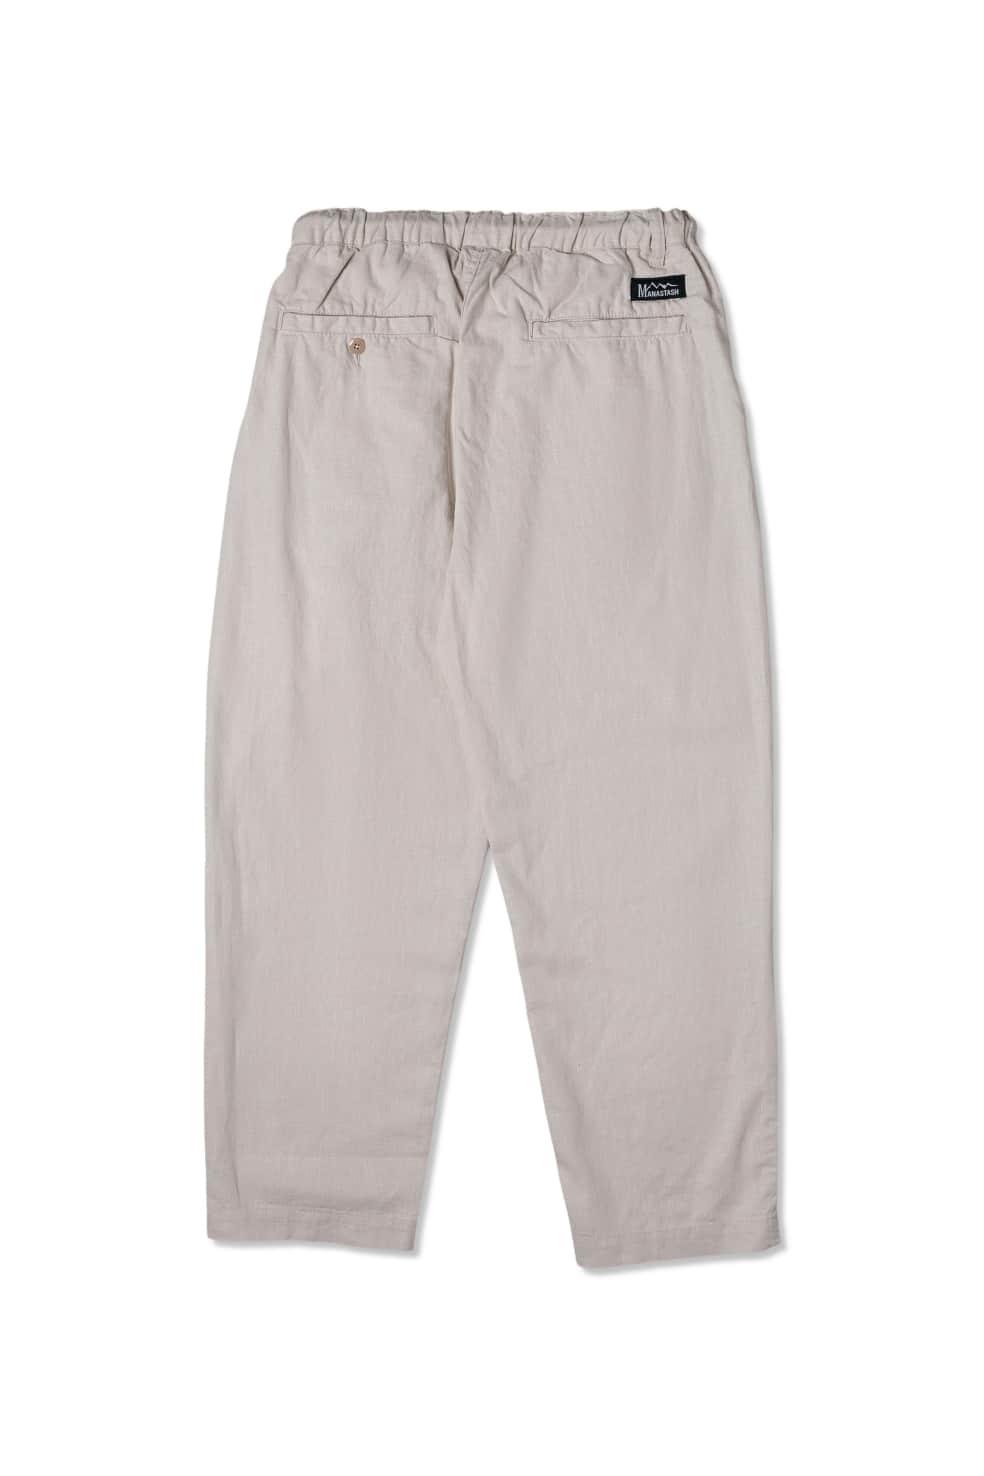 Manastash Wenatchee Pants - Natural   Trousers by Manastash 2